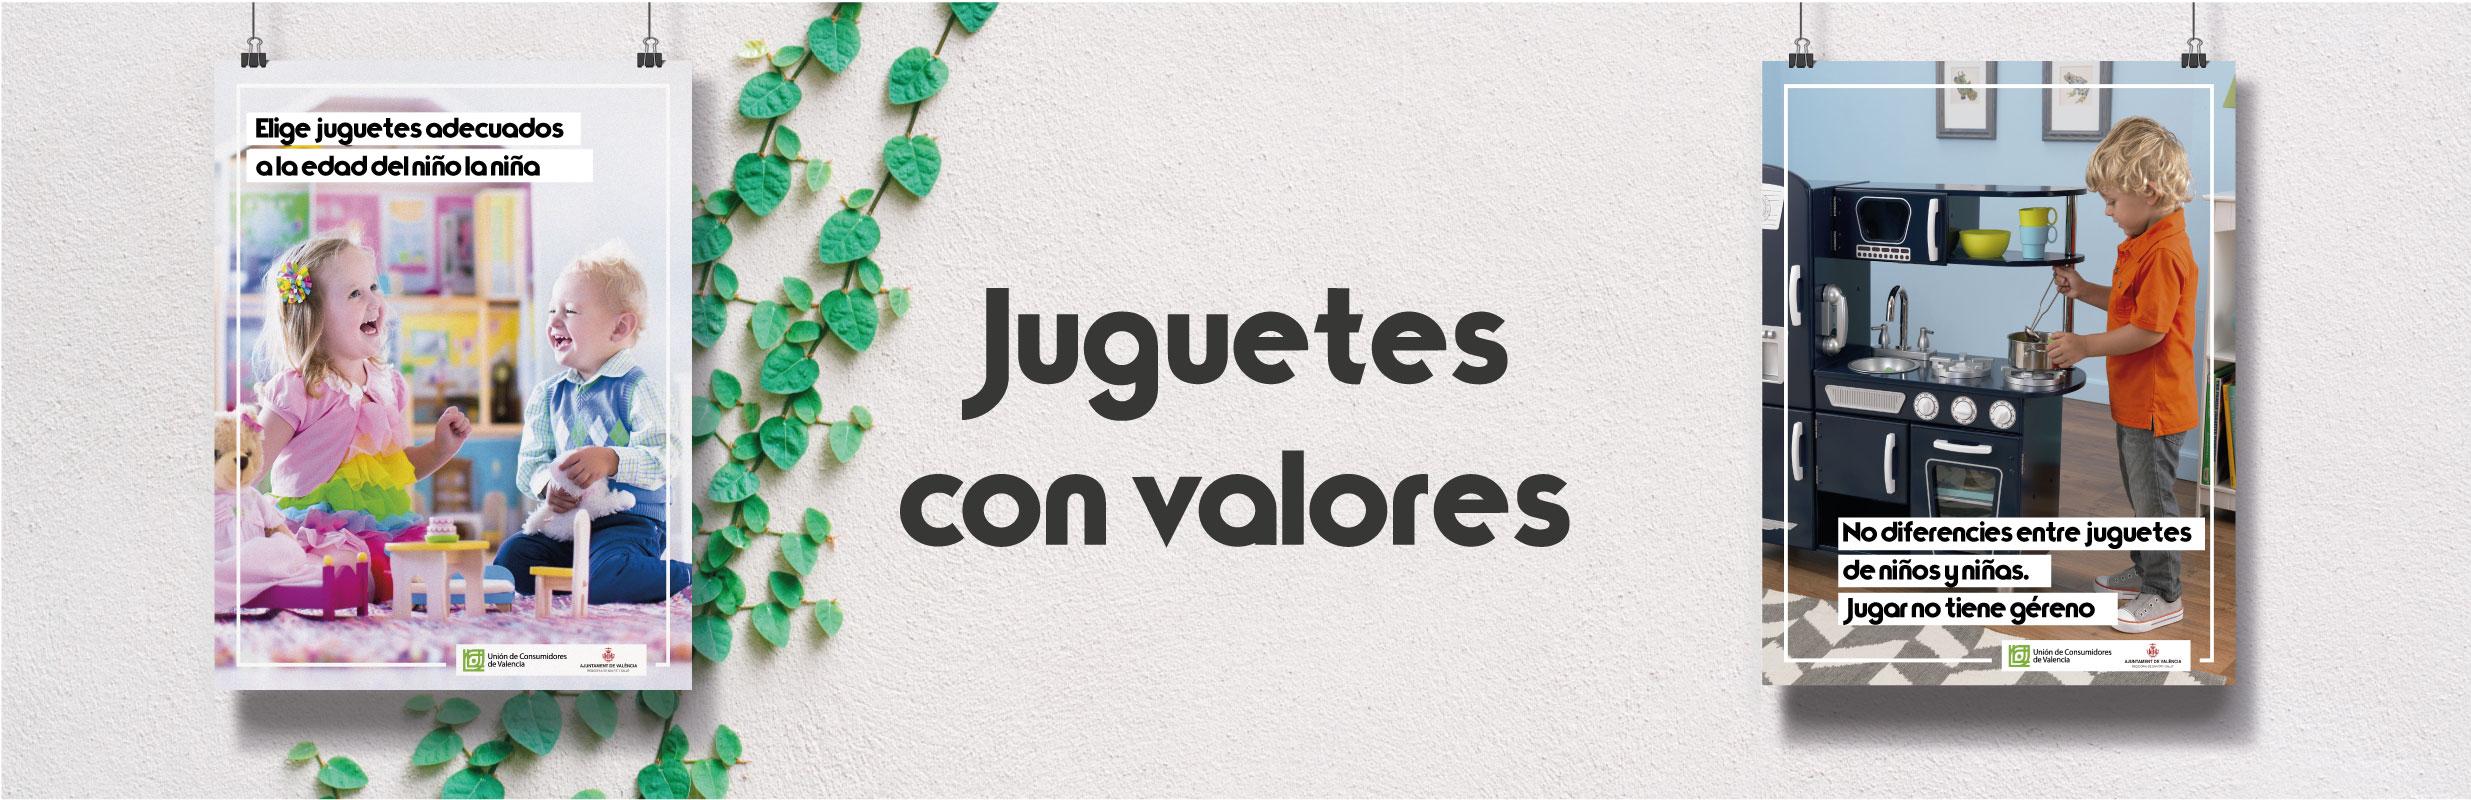 JUGUETES CON VALORES